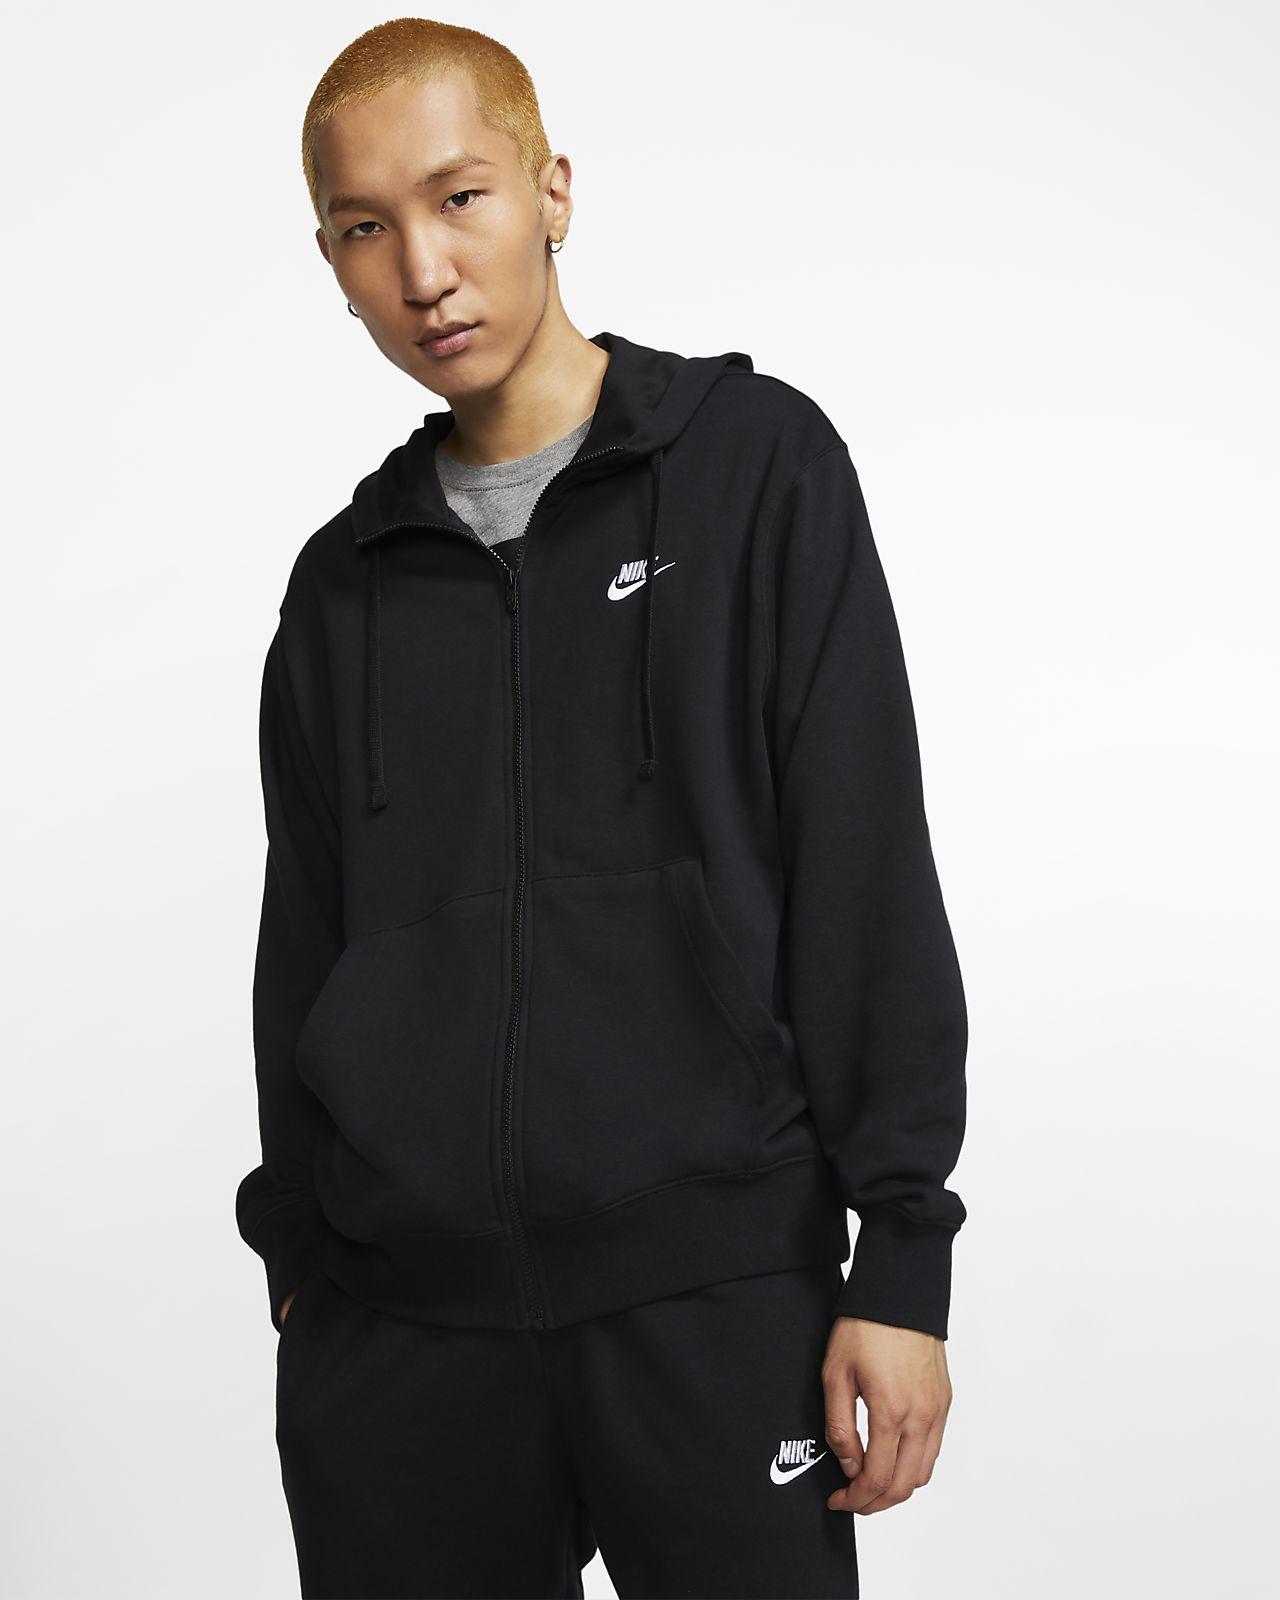 mens plus size nike hoodies online shop